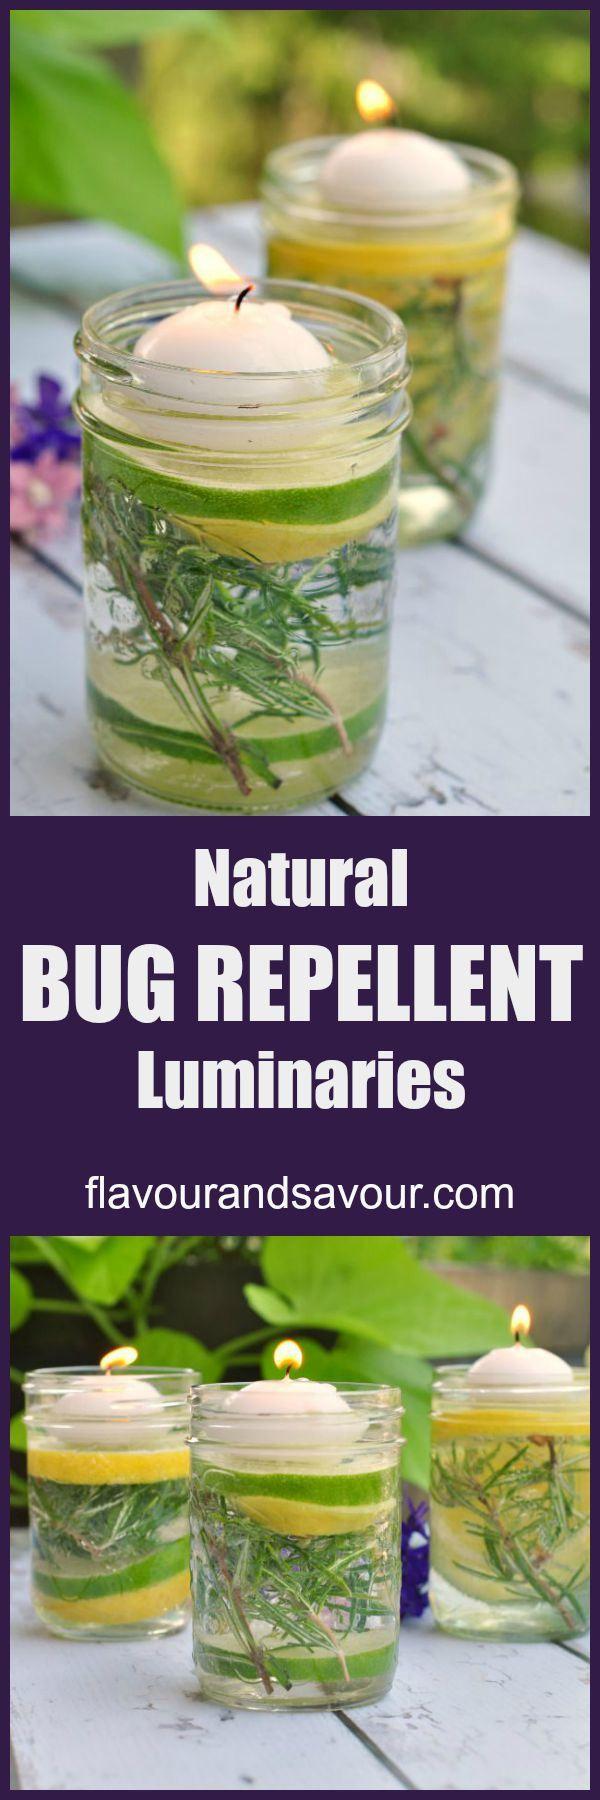 Natural Bug Repellent Luminaries